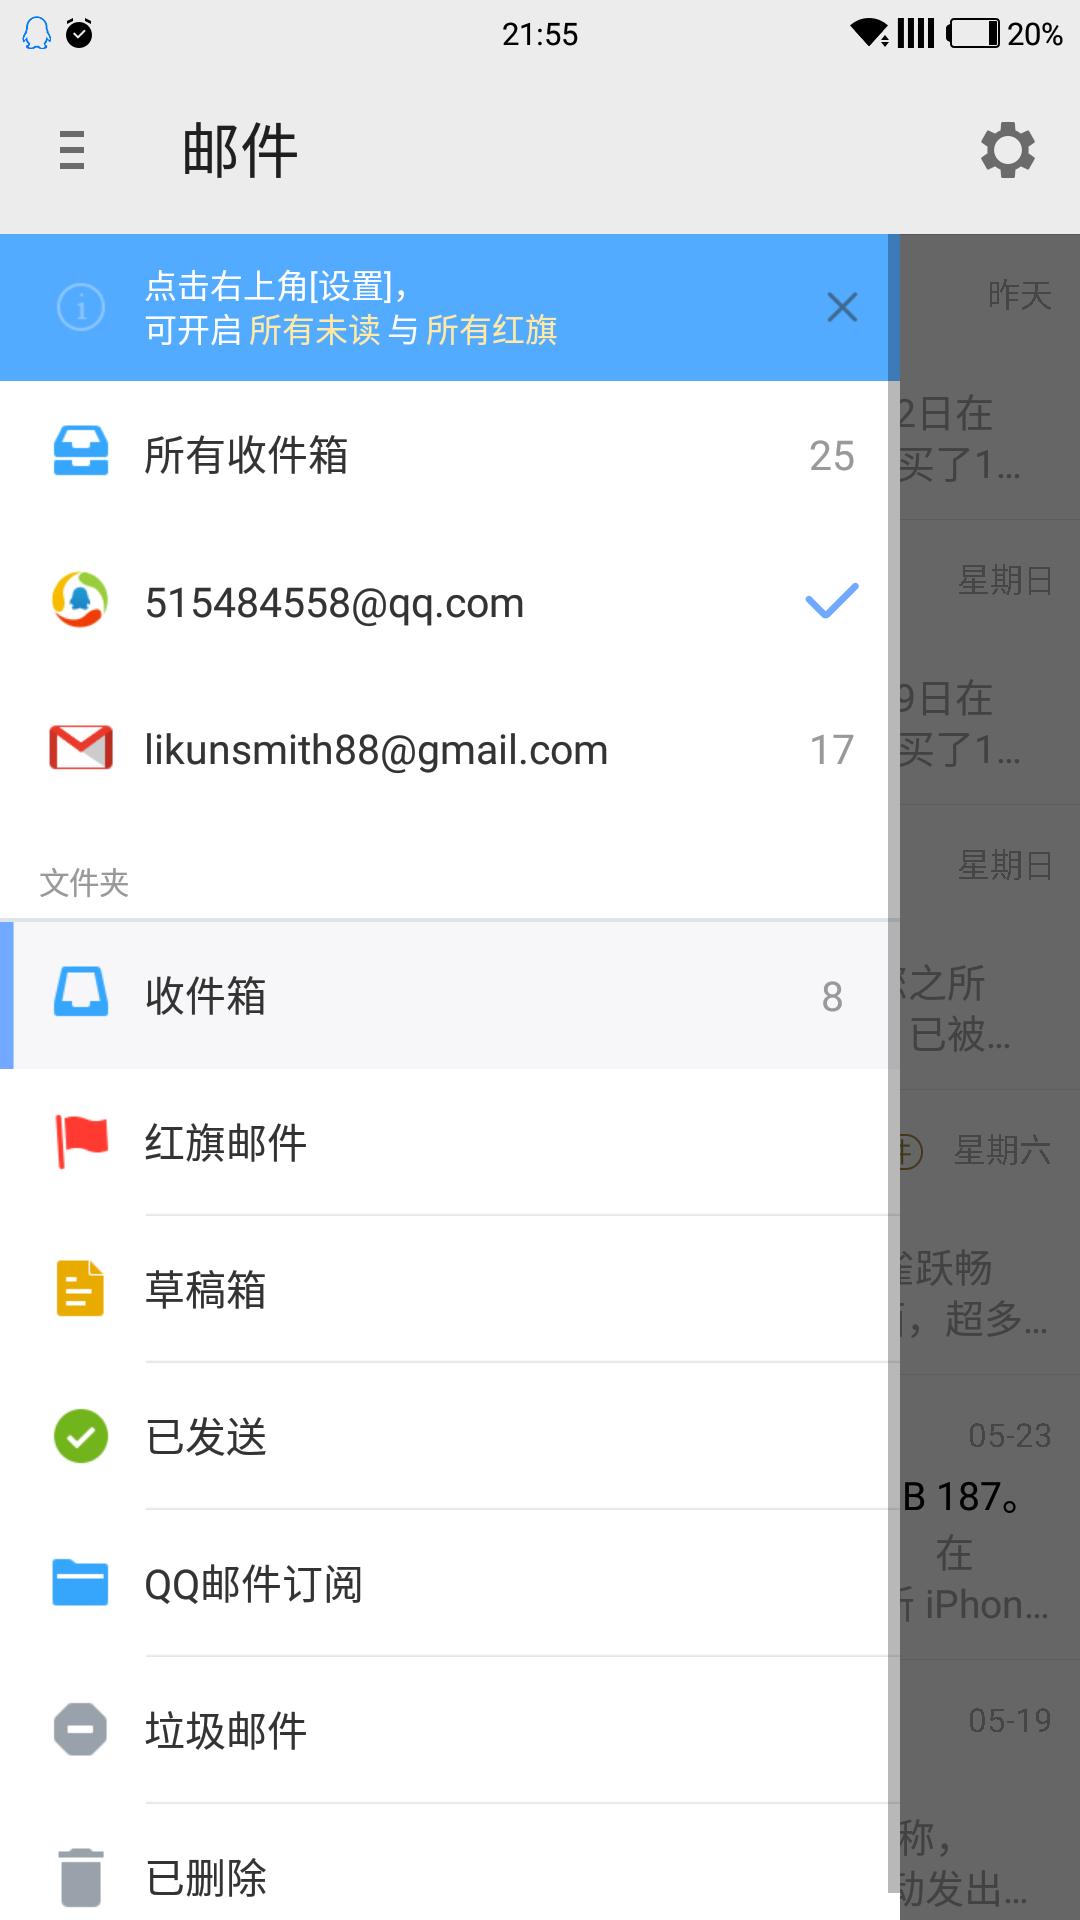 Screenshot_20160603-215554.png